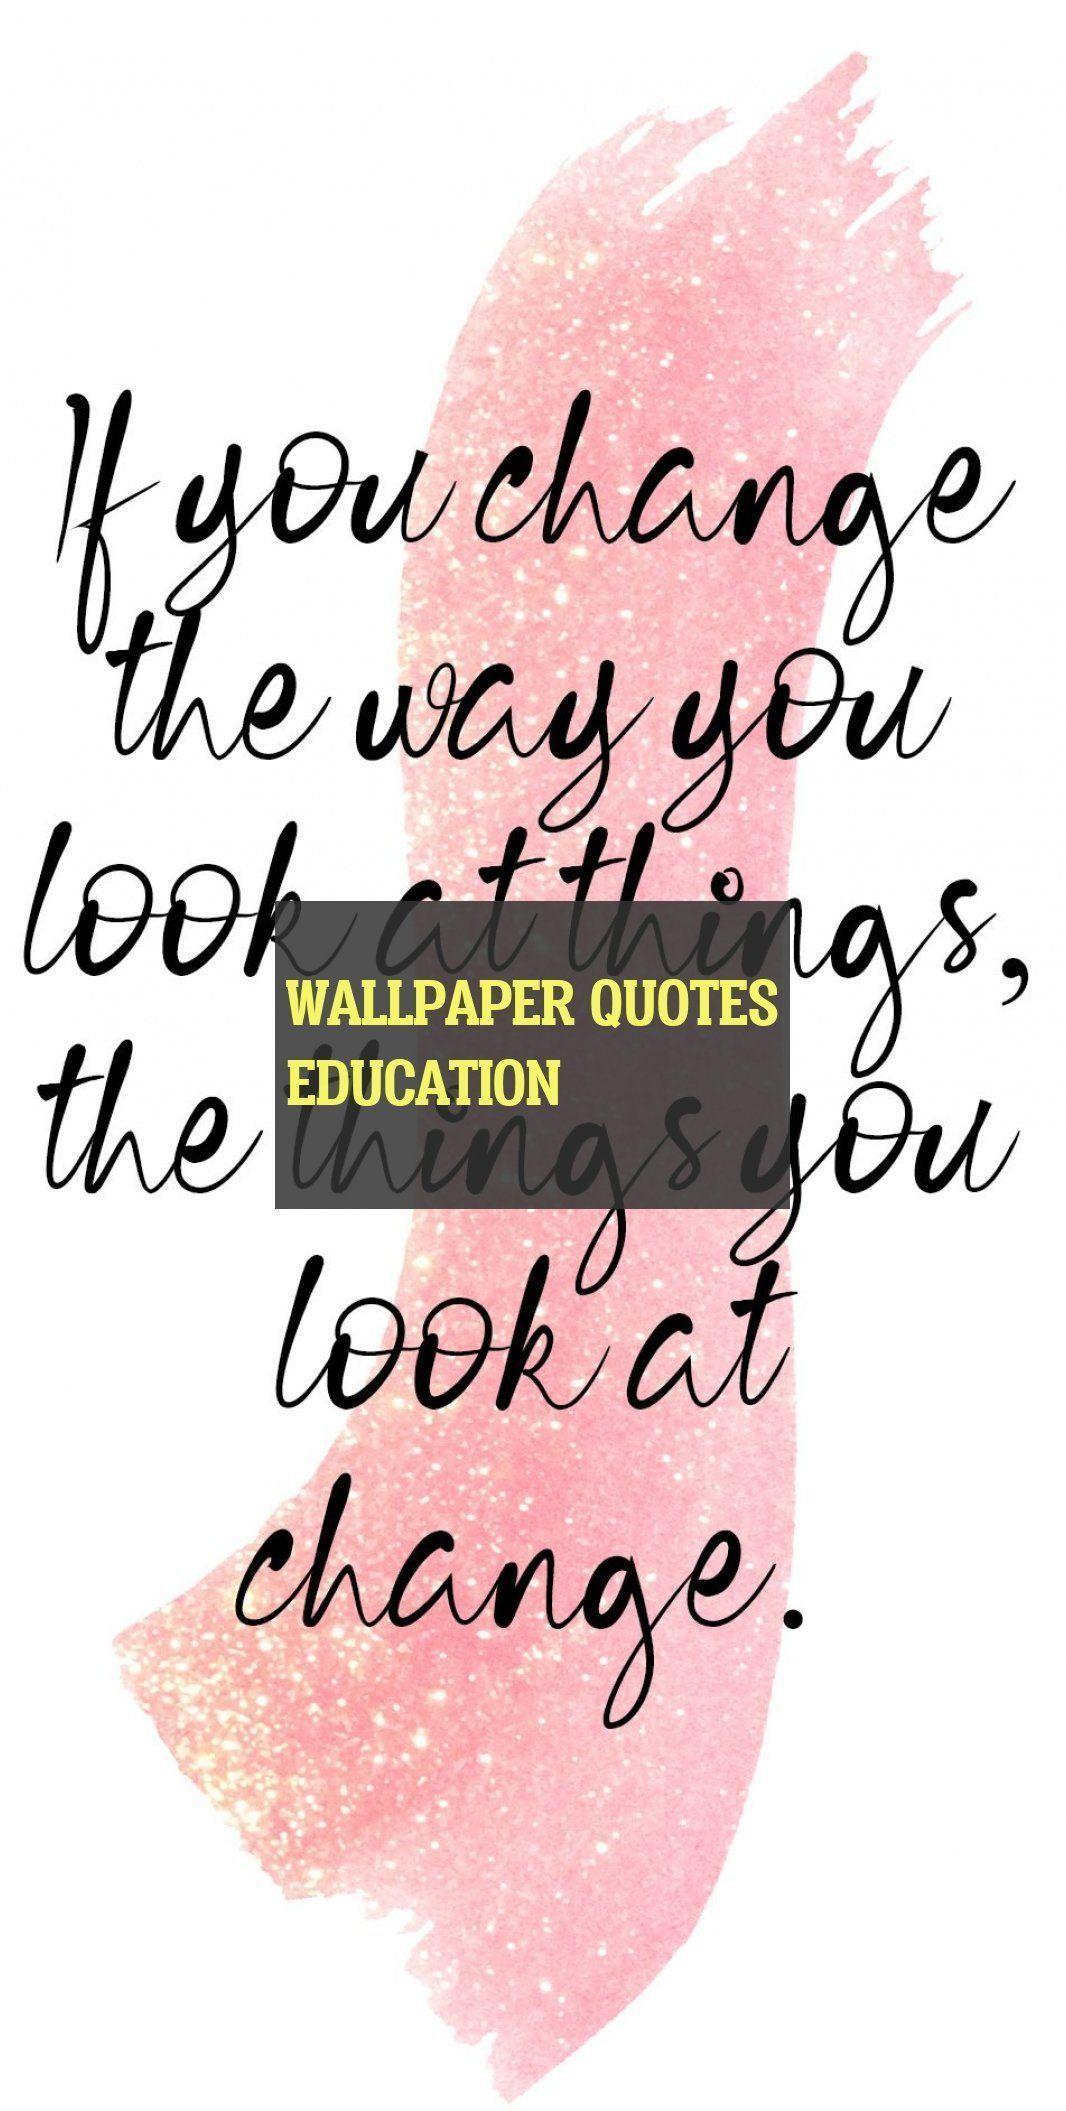 Tapete Zitiert Ausbildung Wallpaper Quotes Education Education Anfuhrungsstriche Anfuhrungsstriche Ausbildung Education In 2020 Zitate Uber Bildung Bildung Zitieren